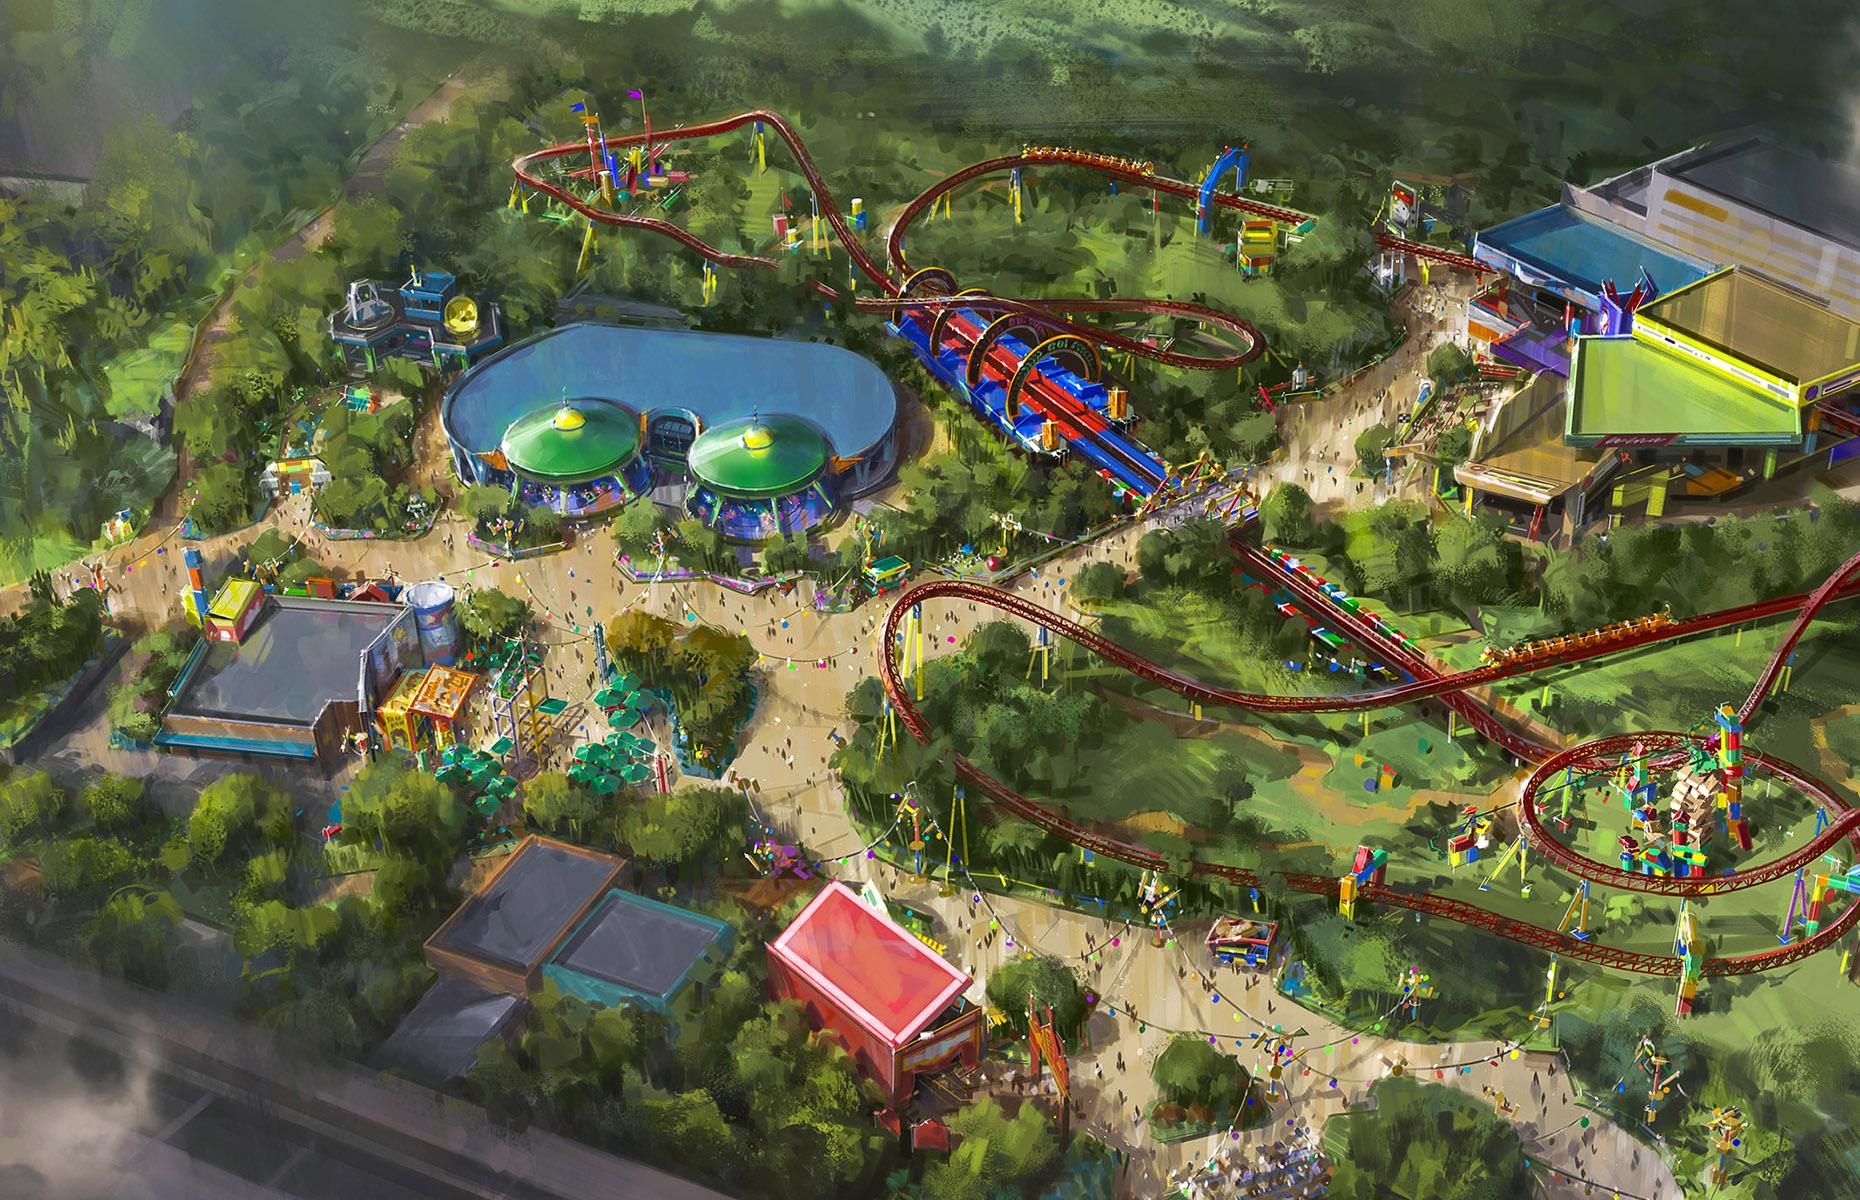 Toy Story Land, Disney